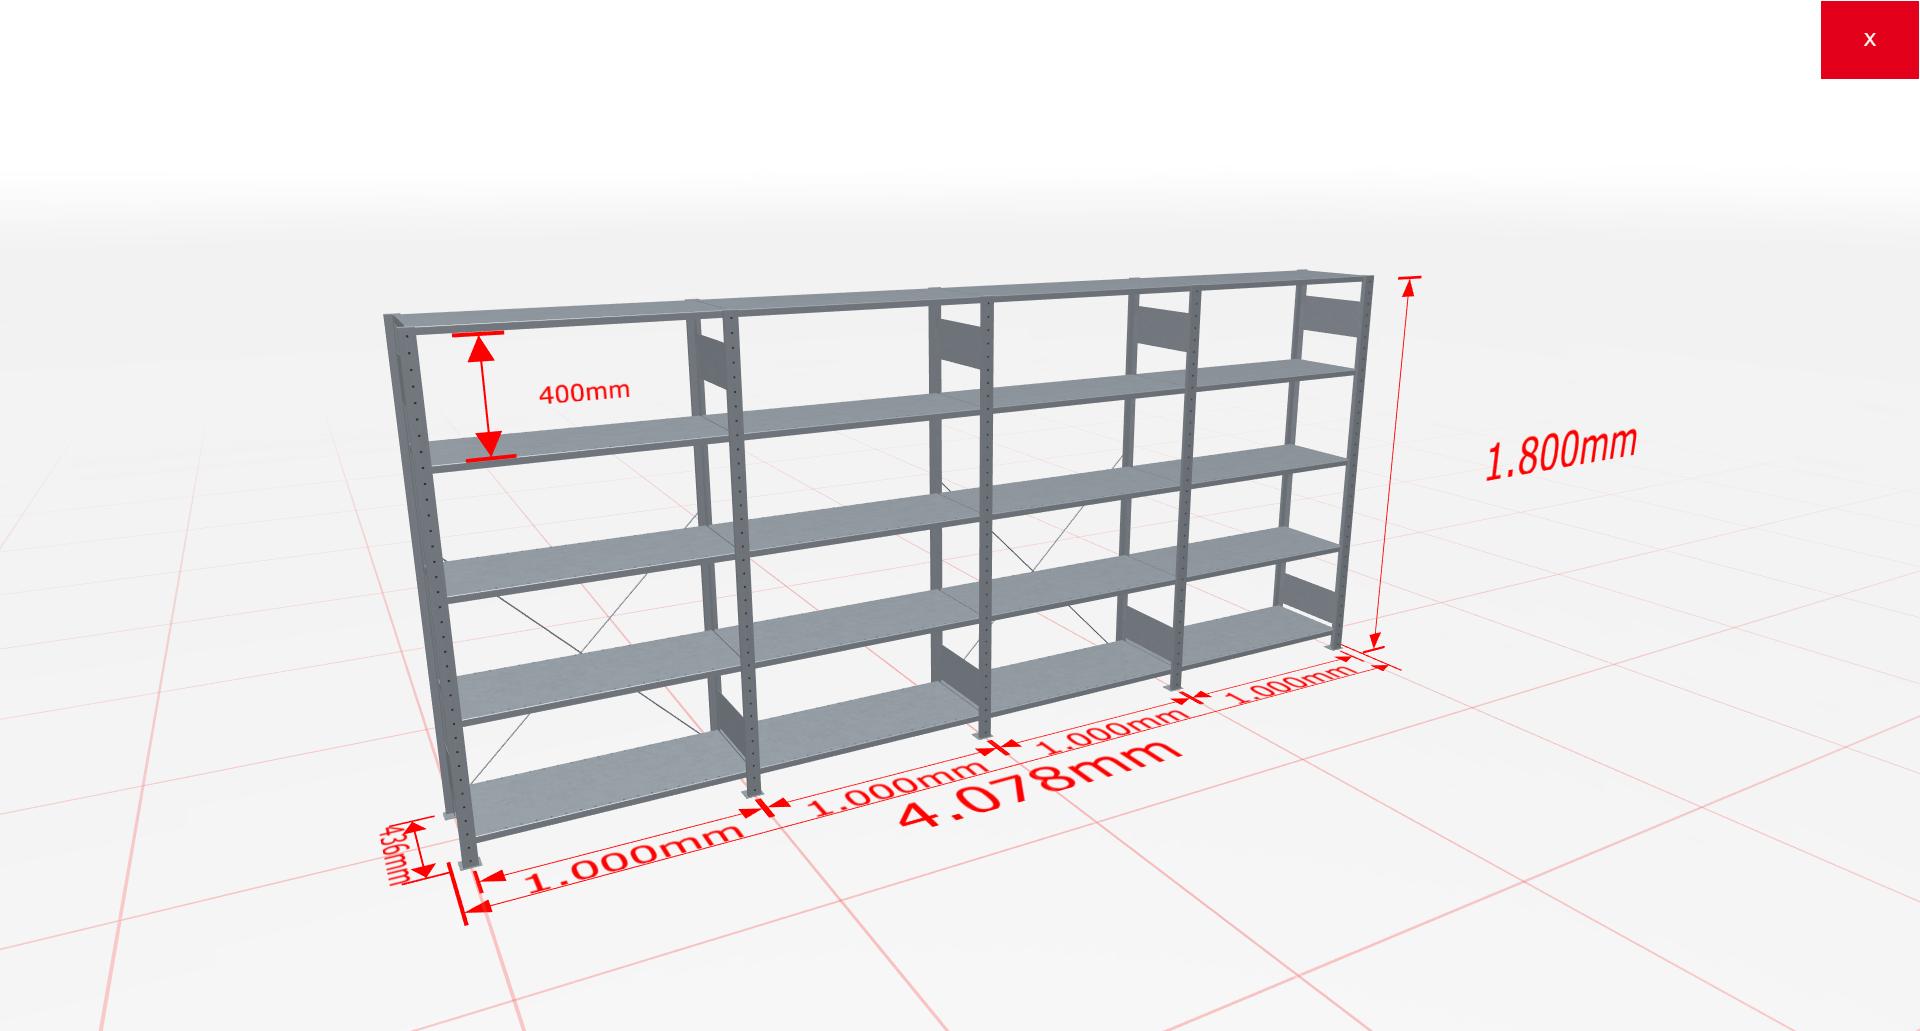 Fachbodenregal Komplettregal 1800x4078x400 mm (HxBxT) SCHULTE Lagertechnik verzinkt 5 Ebenen  150 kg je Boden